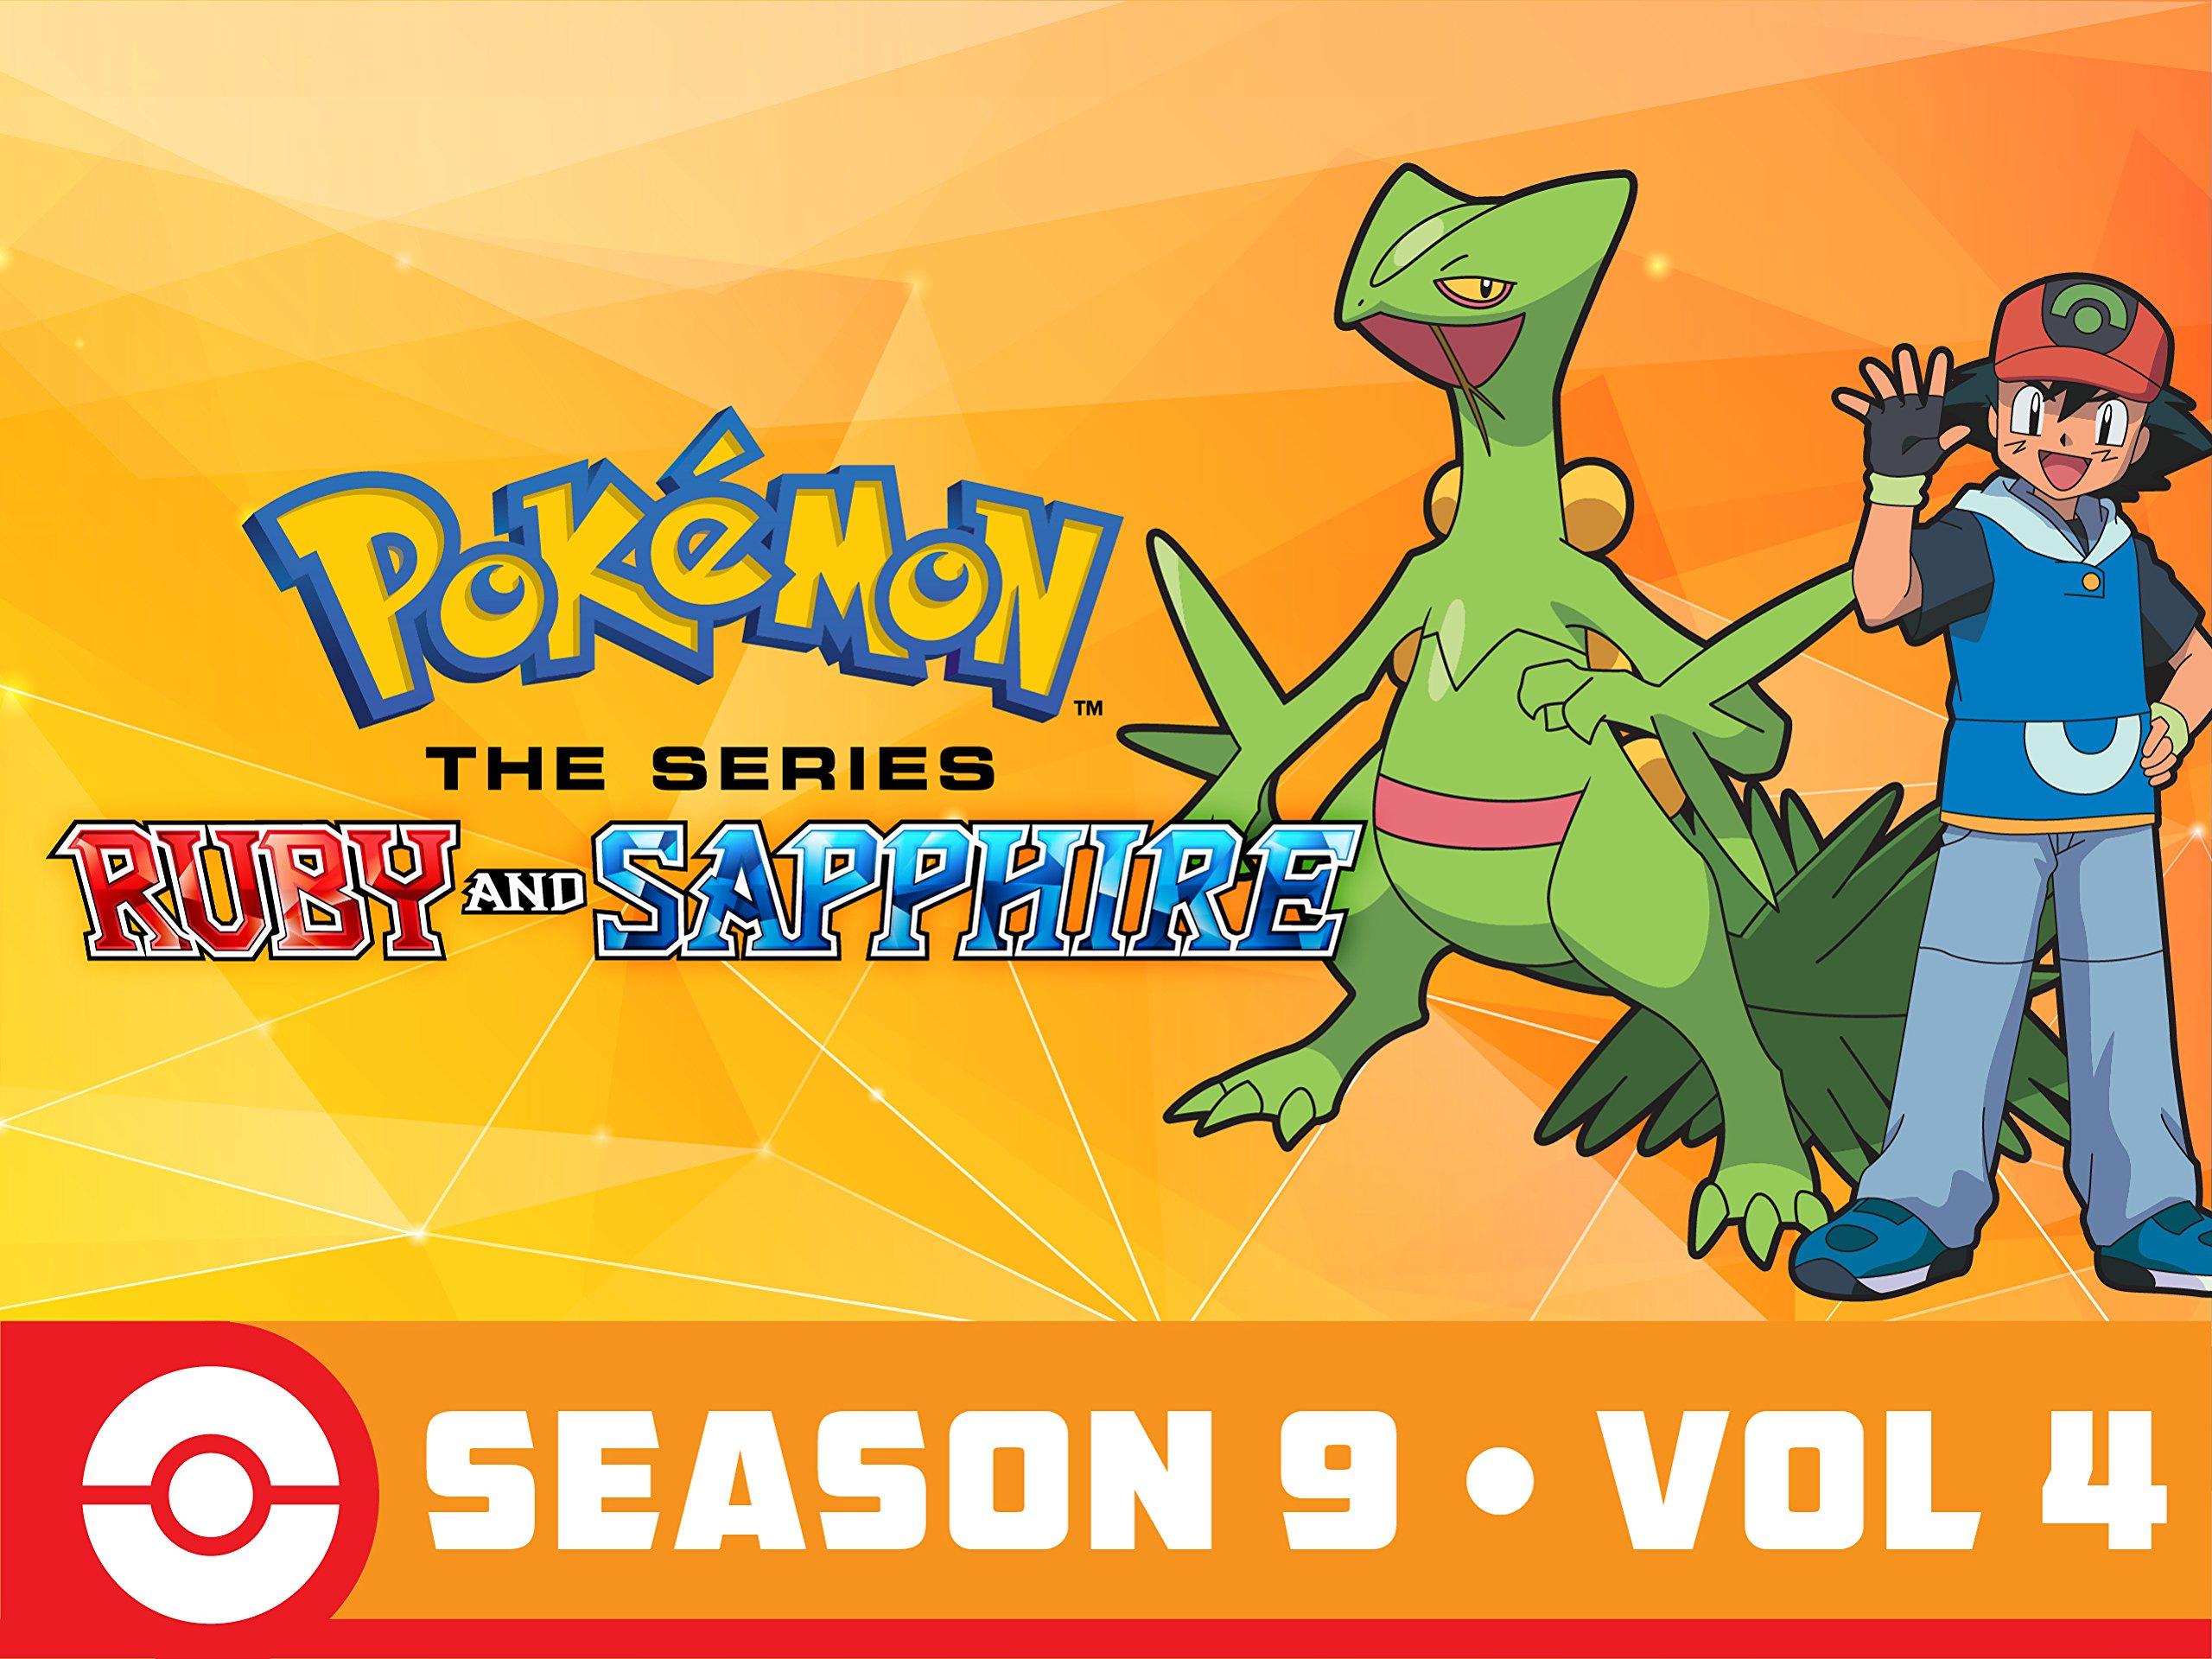 Pokémon the Series: Ruby & Sapphire on Amazon Prime Video UK